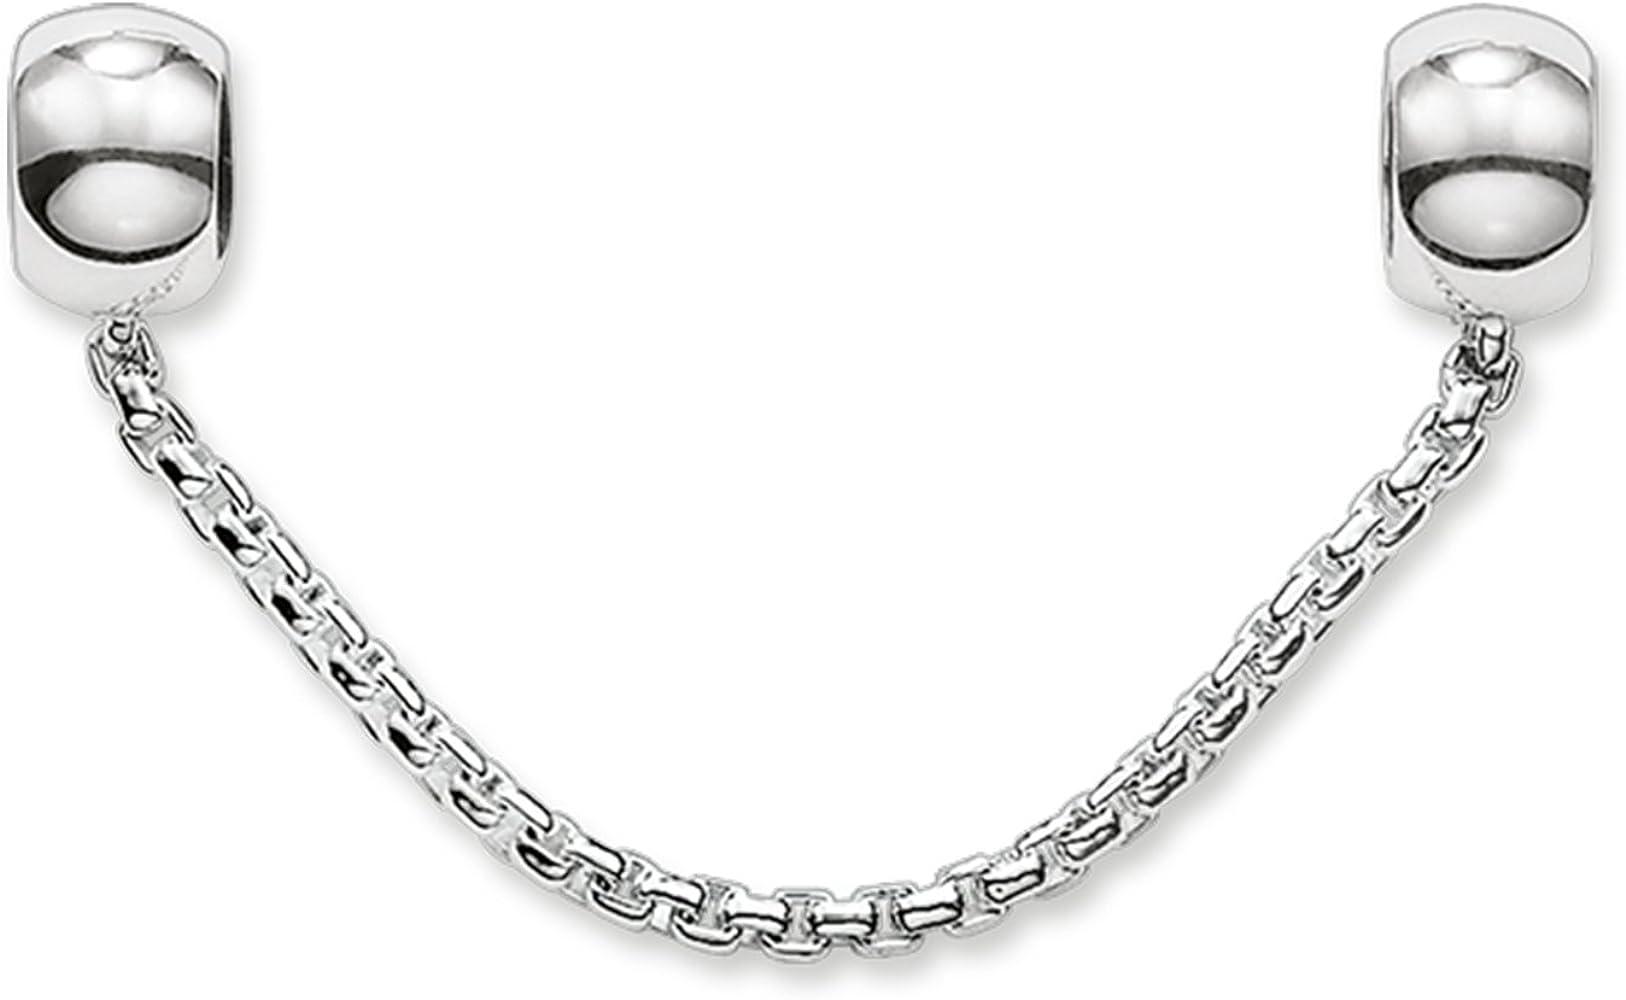 Thomas Sabo Karma Beads Silicona KS0004-585-12 Unisex cadena de seguridad Plata de ley 925